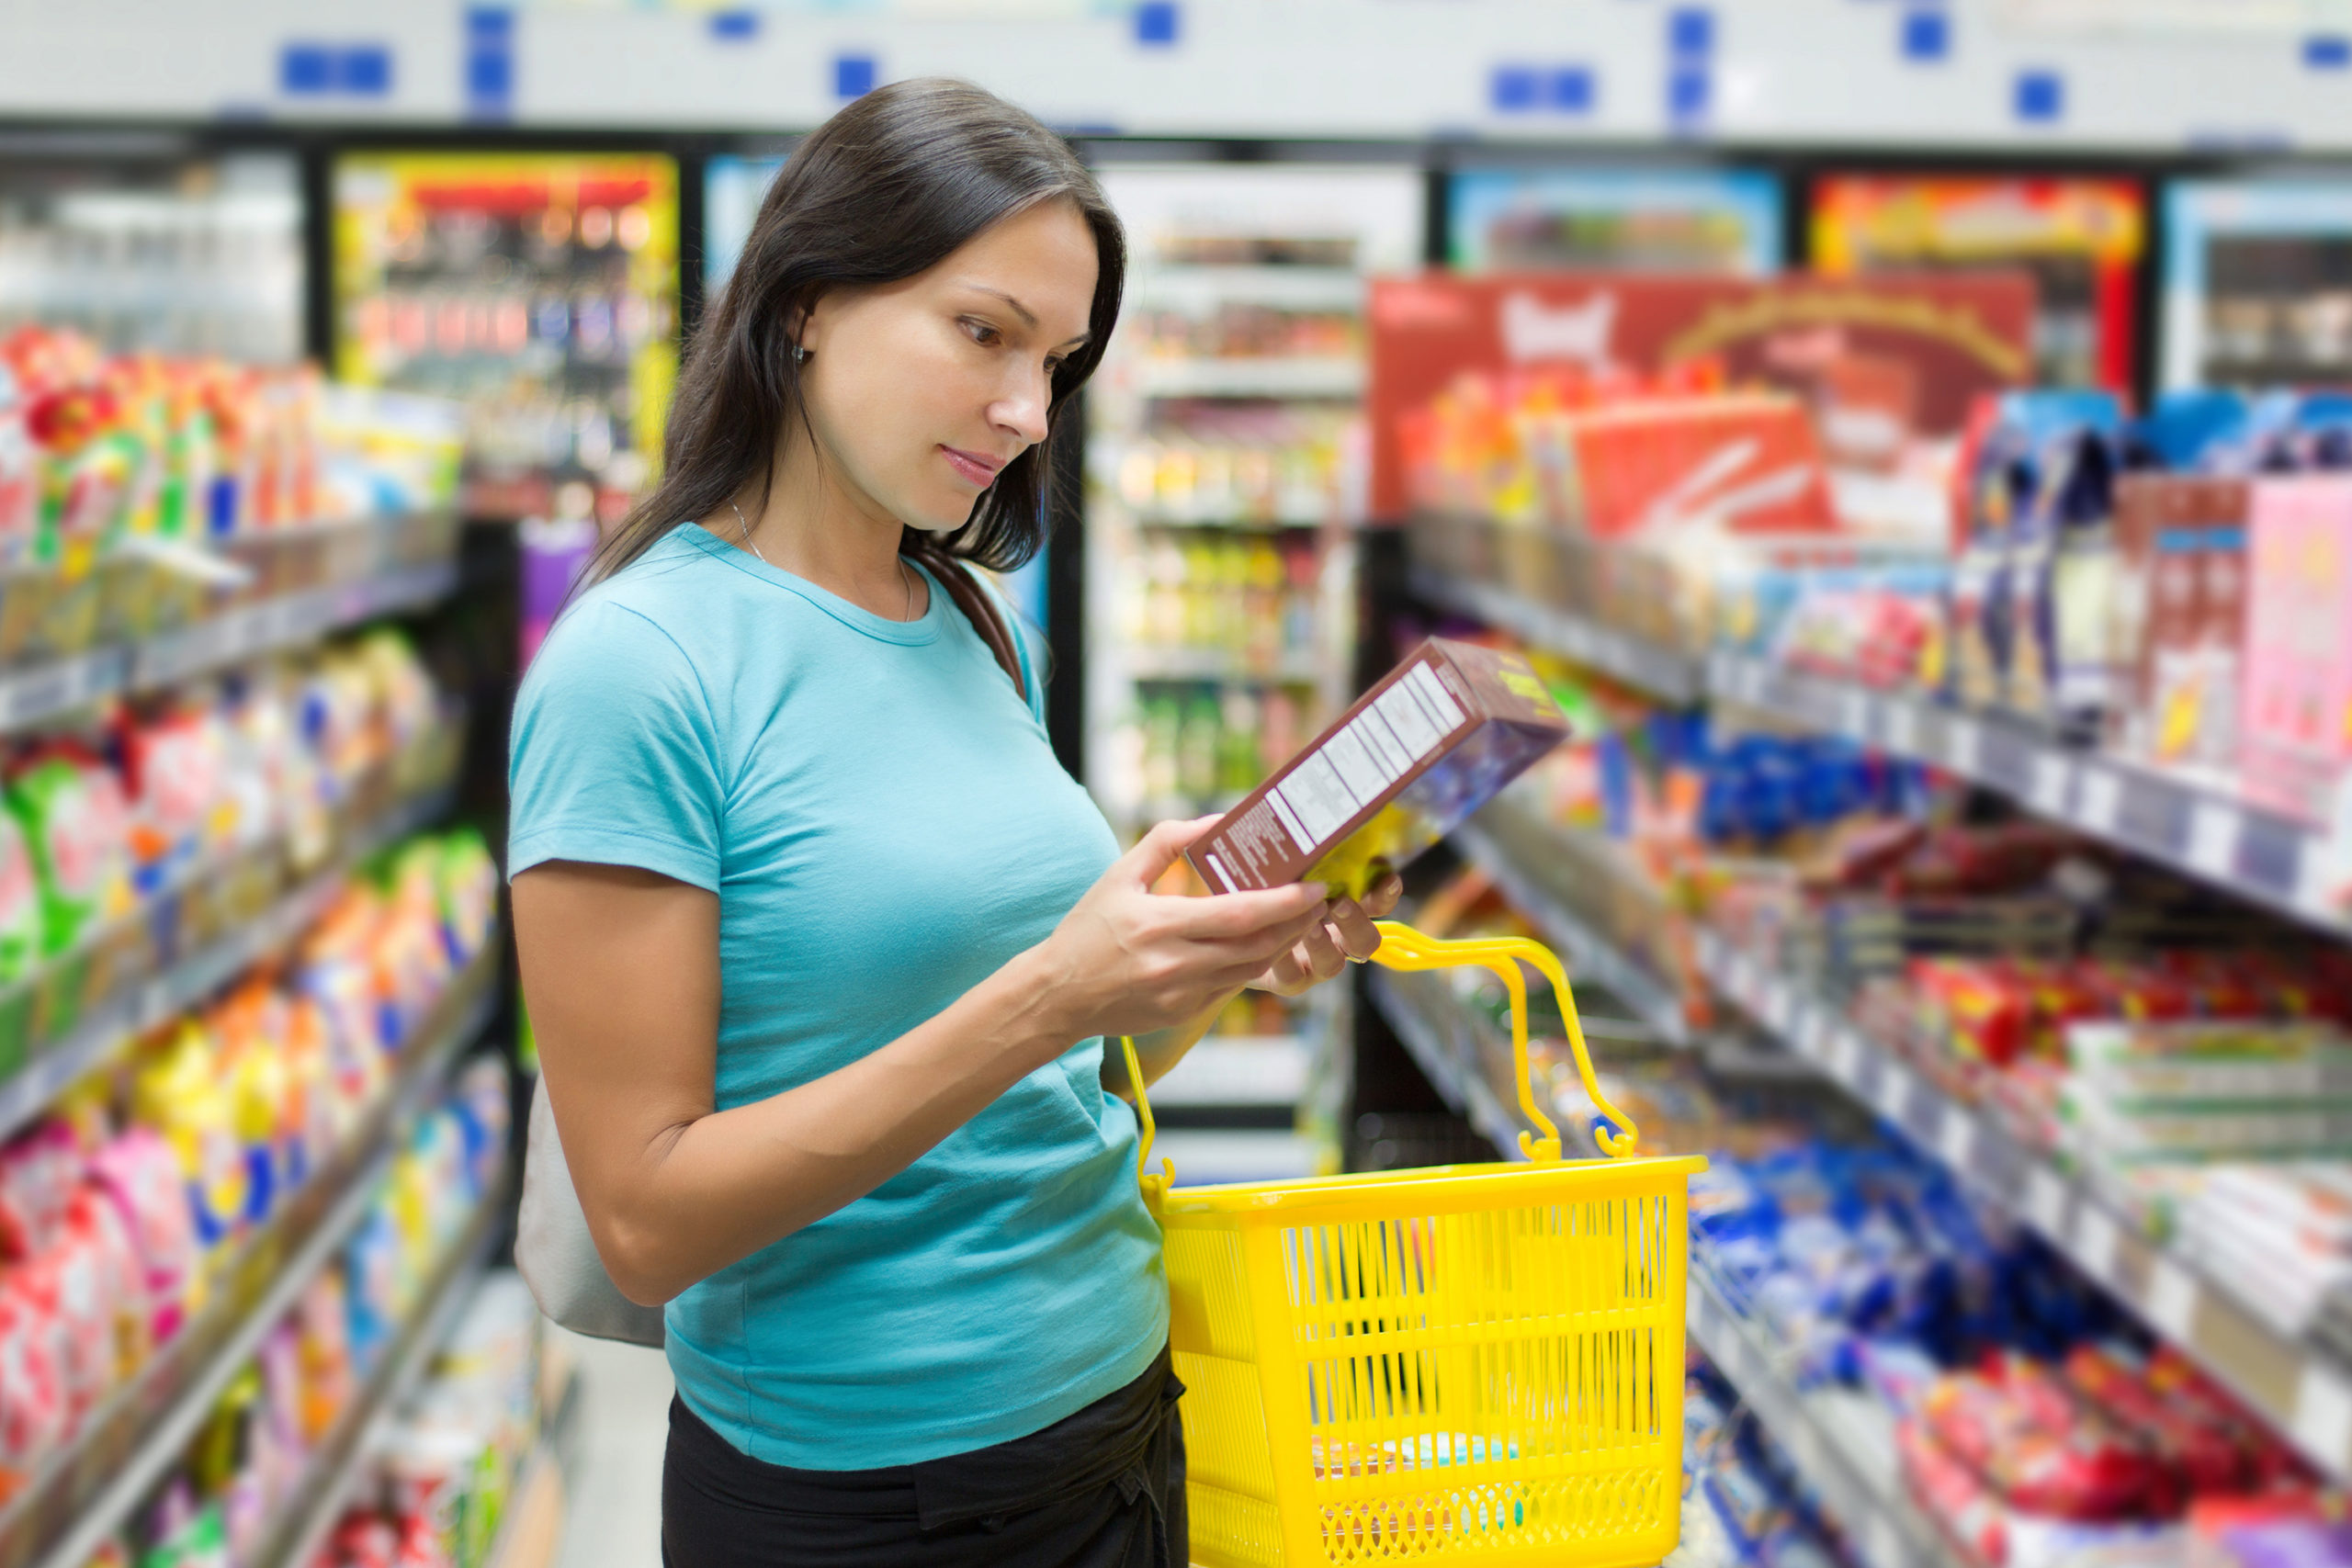 GfK: spadek nastrojów konsumentów